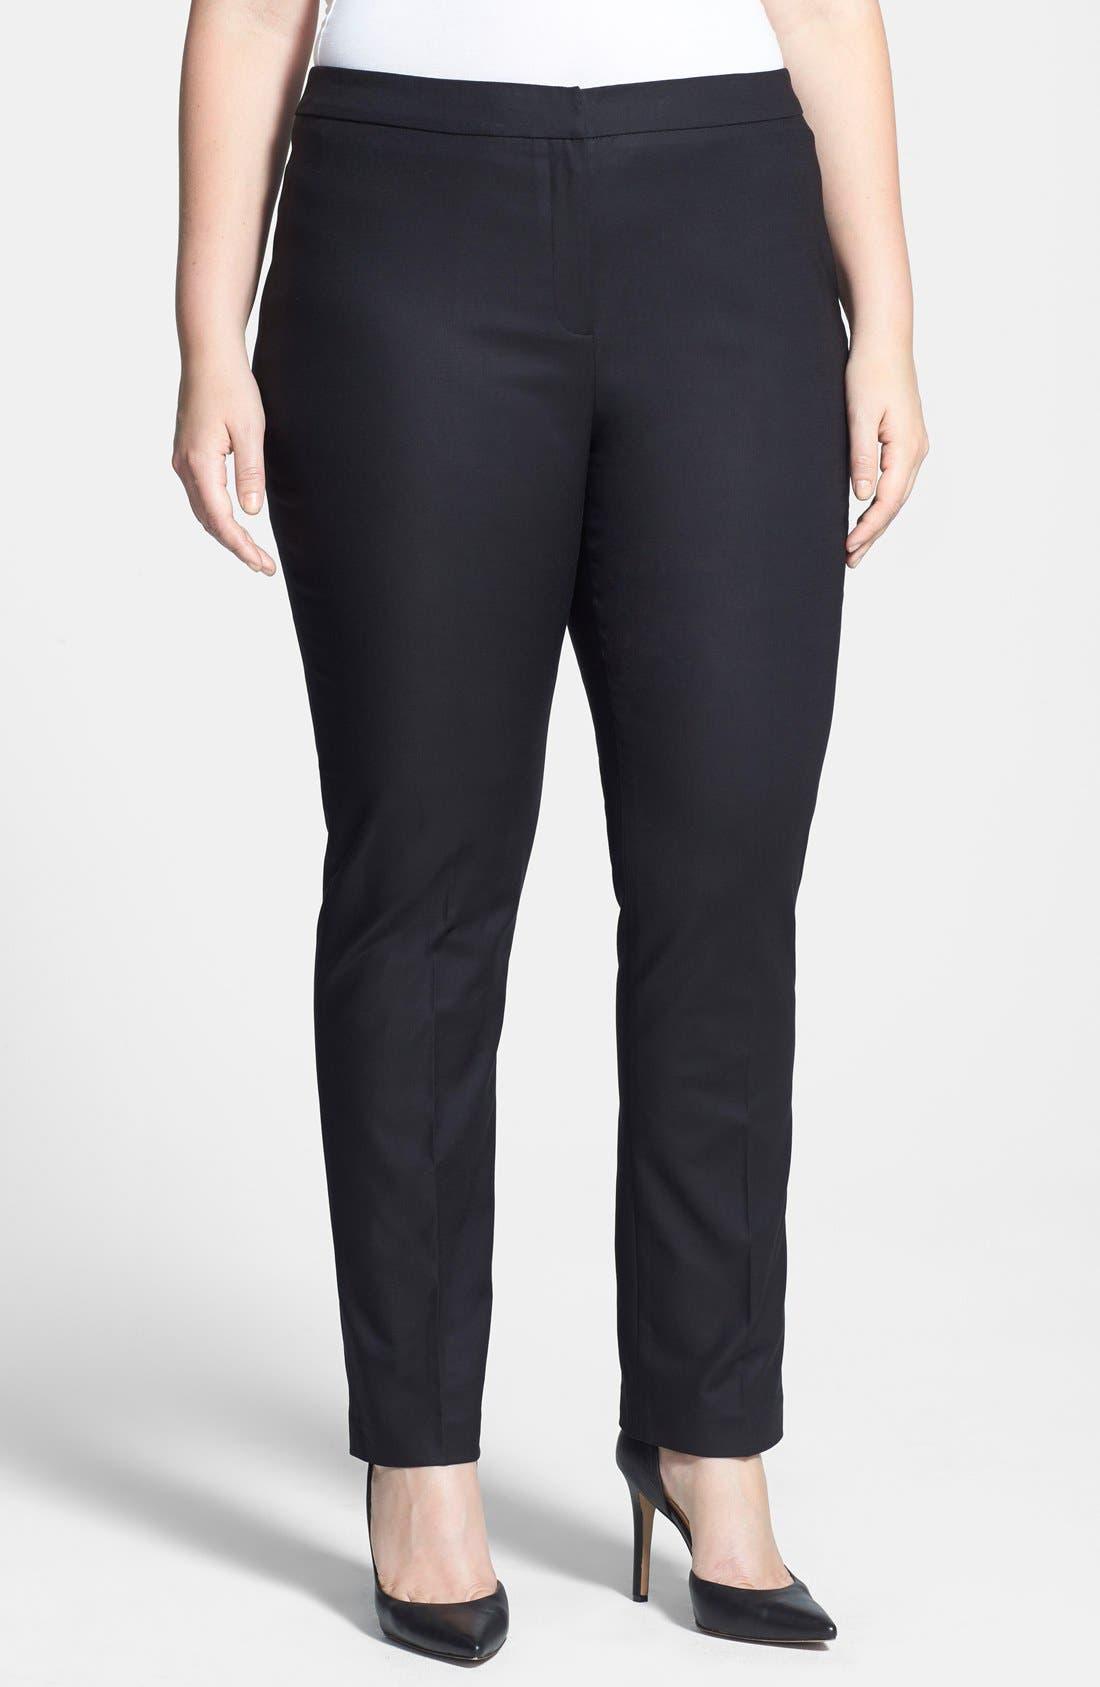 'The Perfect' Pants,                             Main thumbnail 1, color,                             Black Onyx